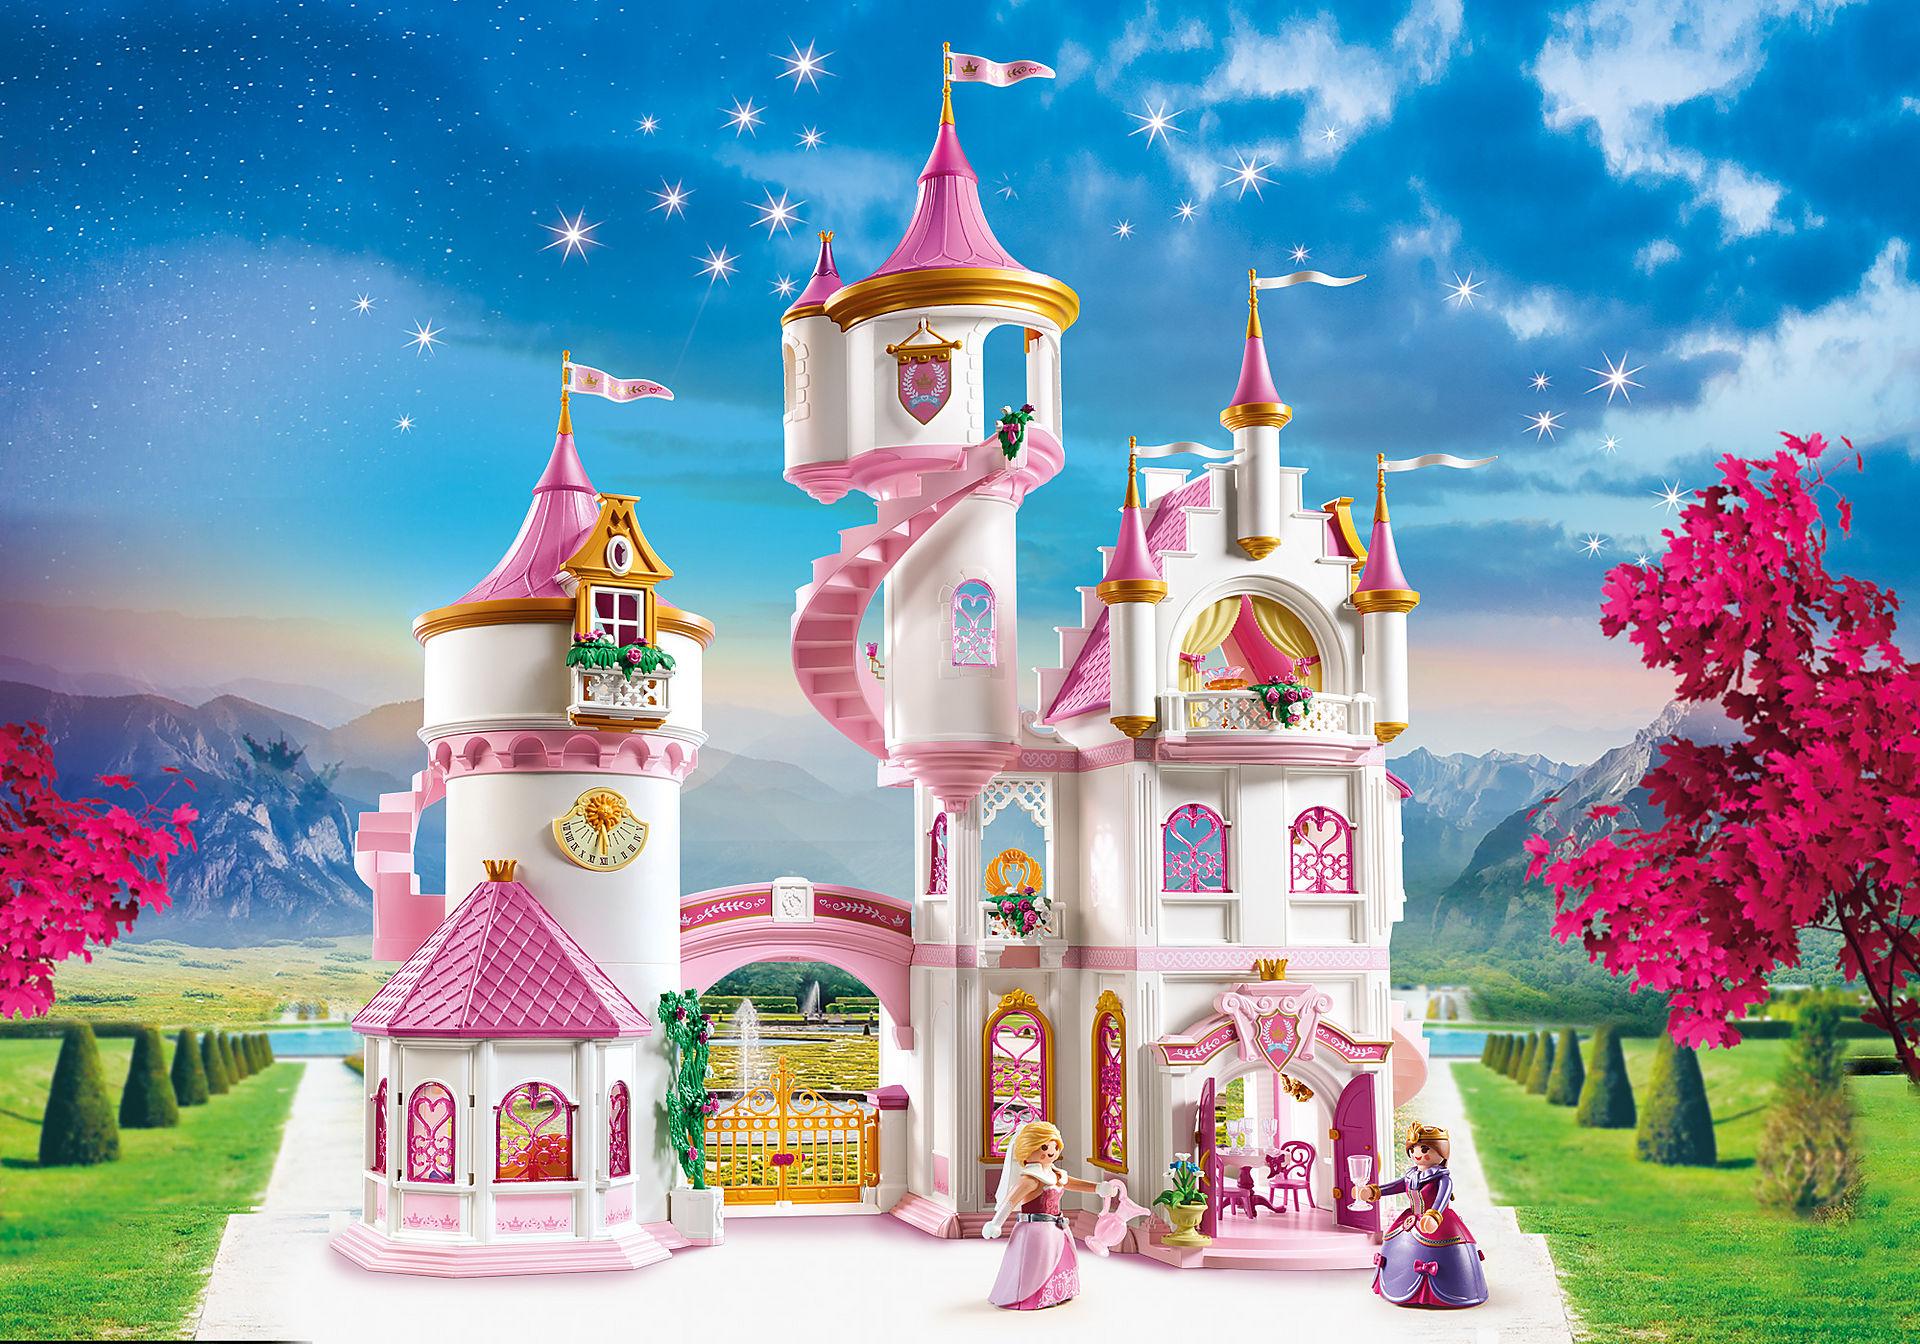 70447 Großes Prinzessinnenschloss zoom image1